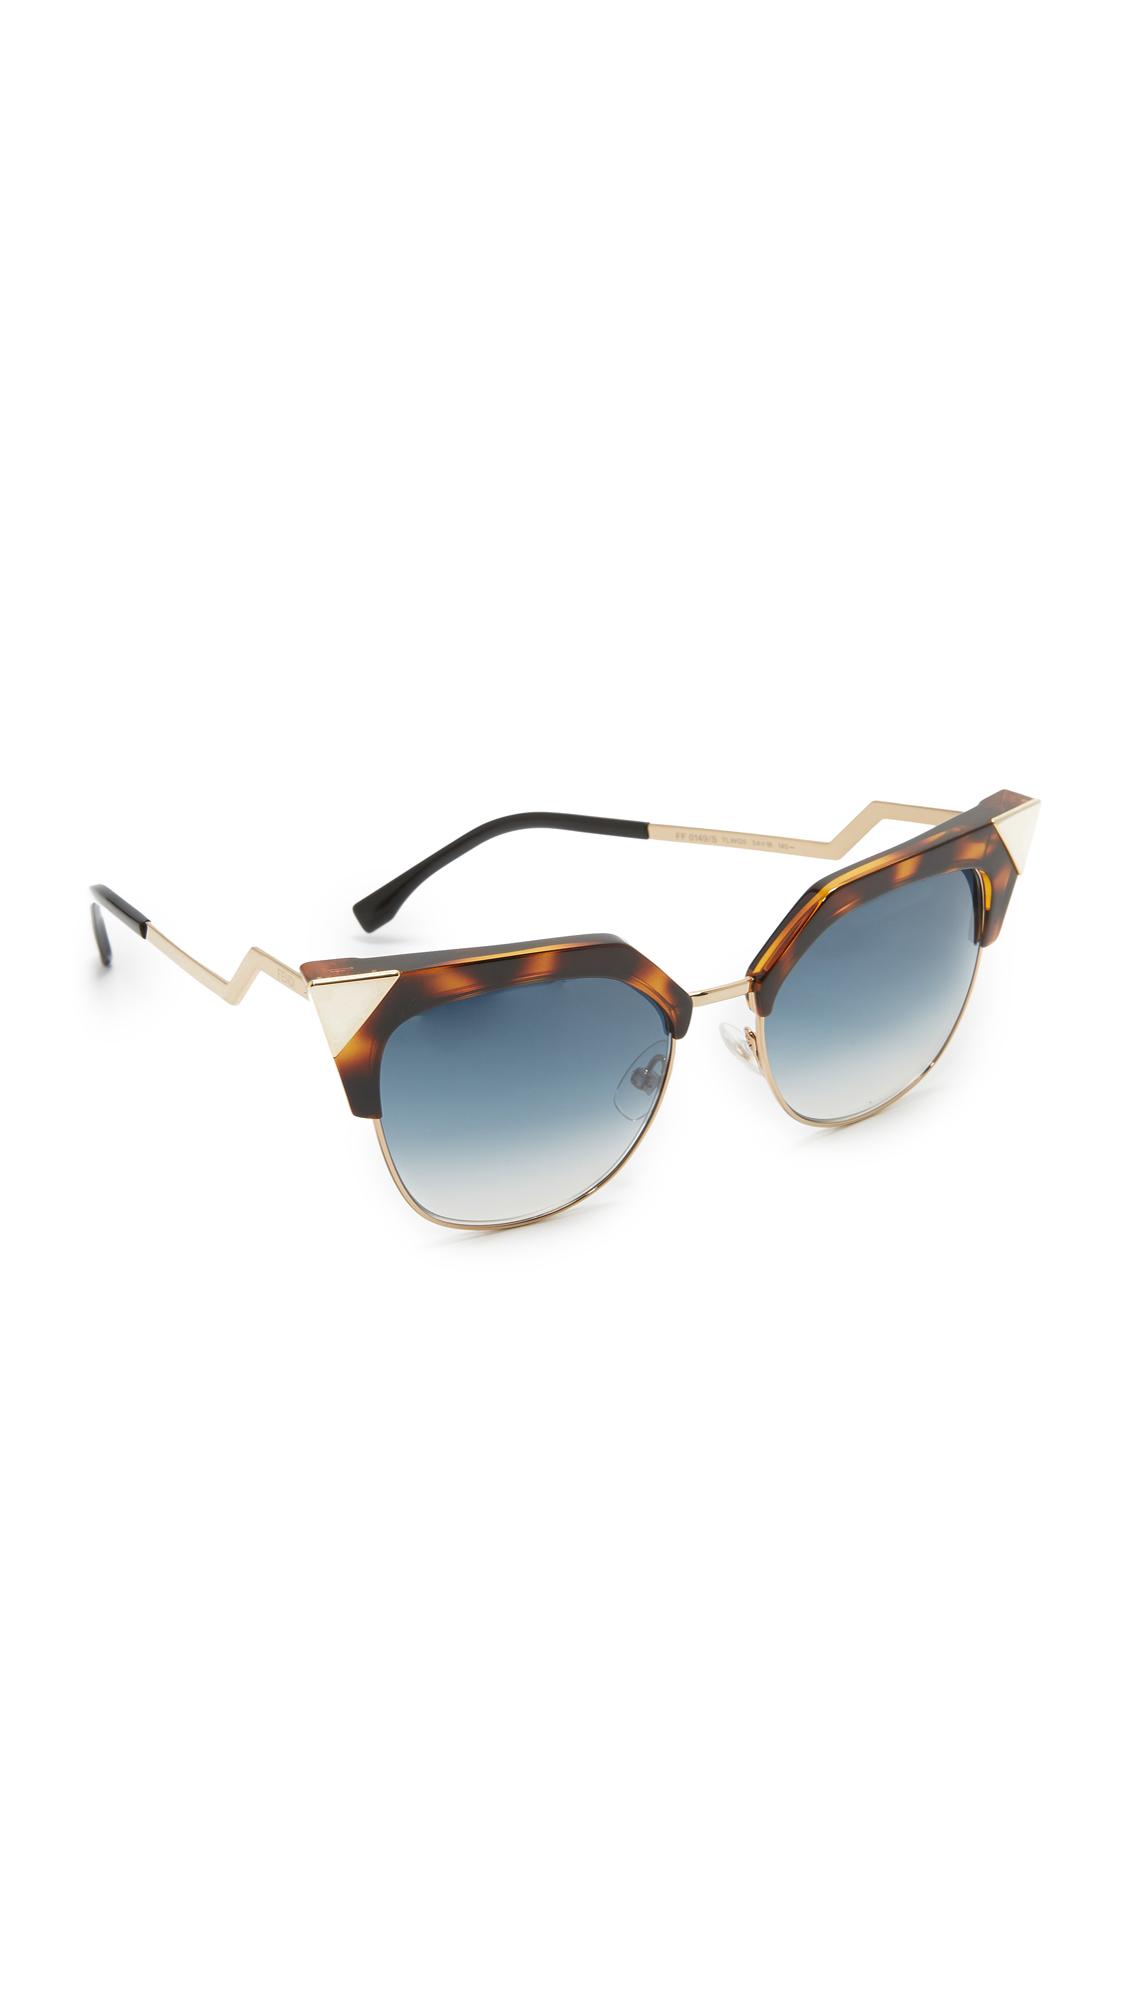 Fendi Iridia Crystal Corner Sunglasses - Havana Gold/Azure at Shopbop